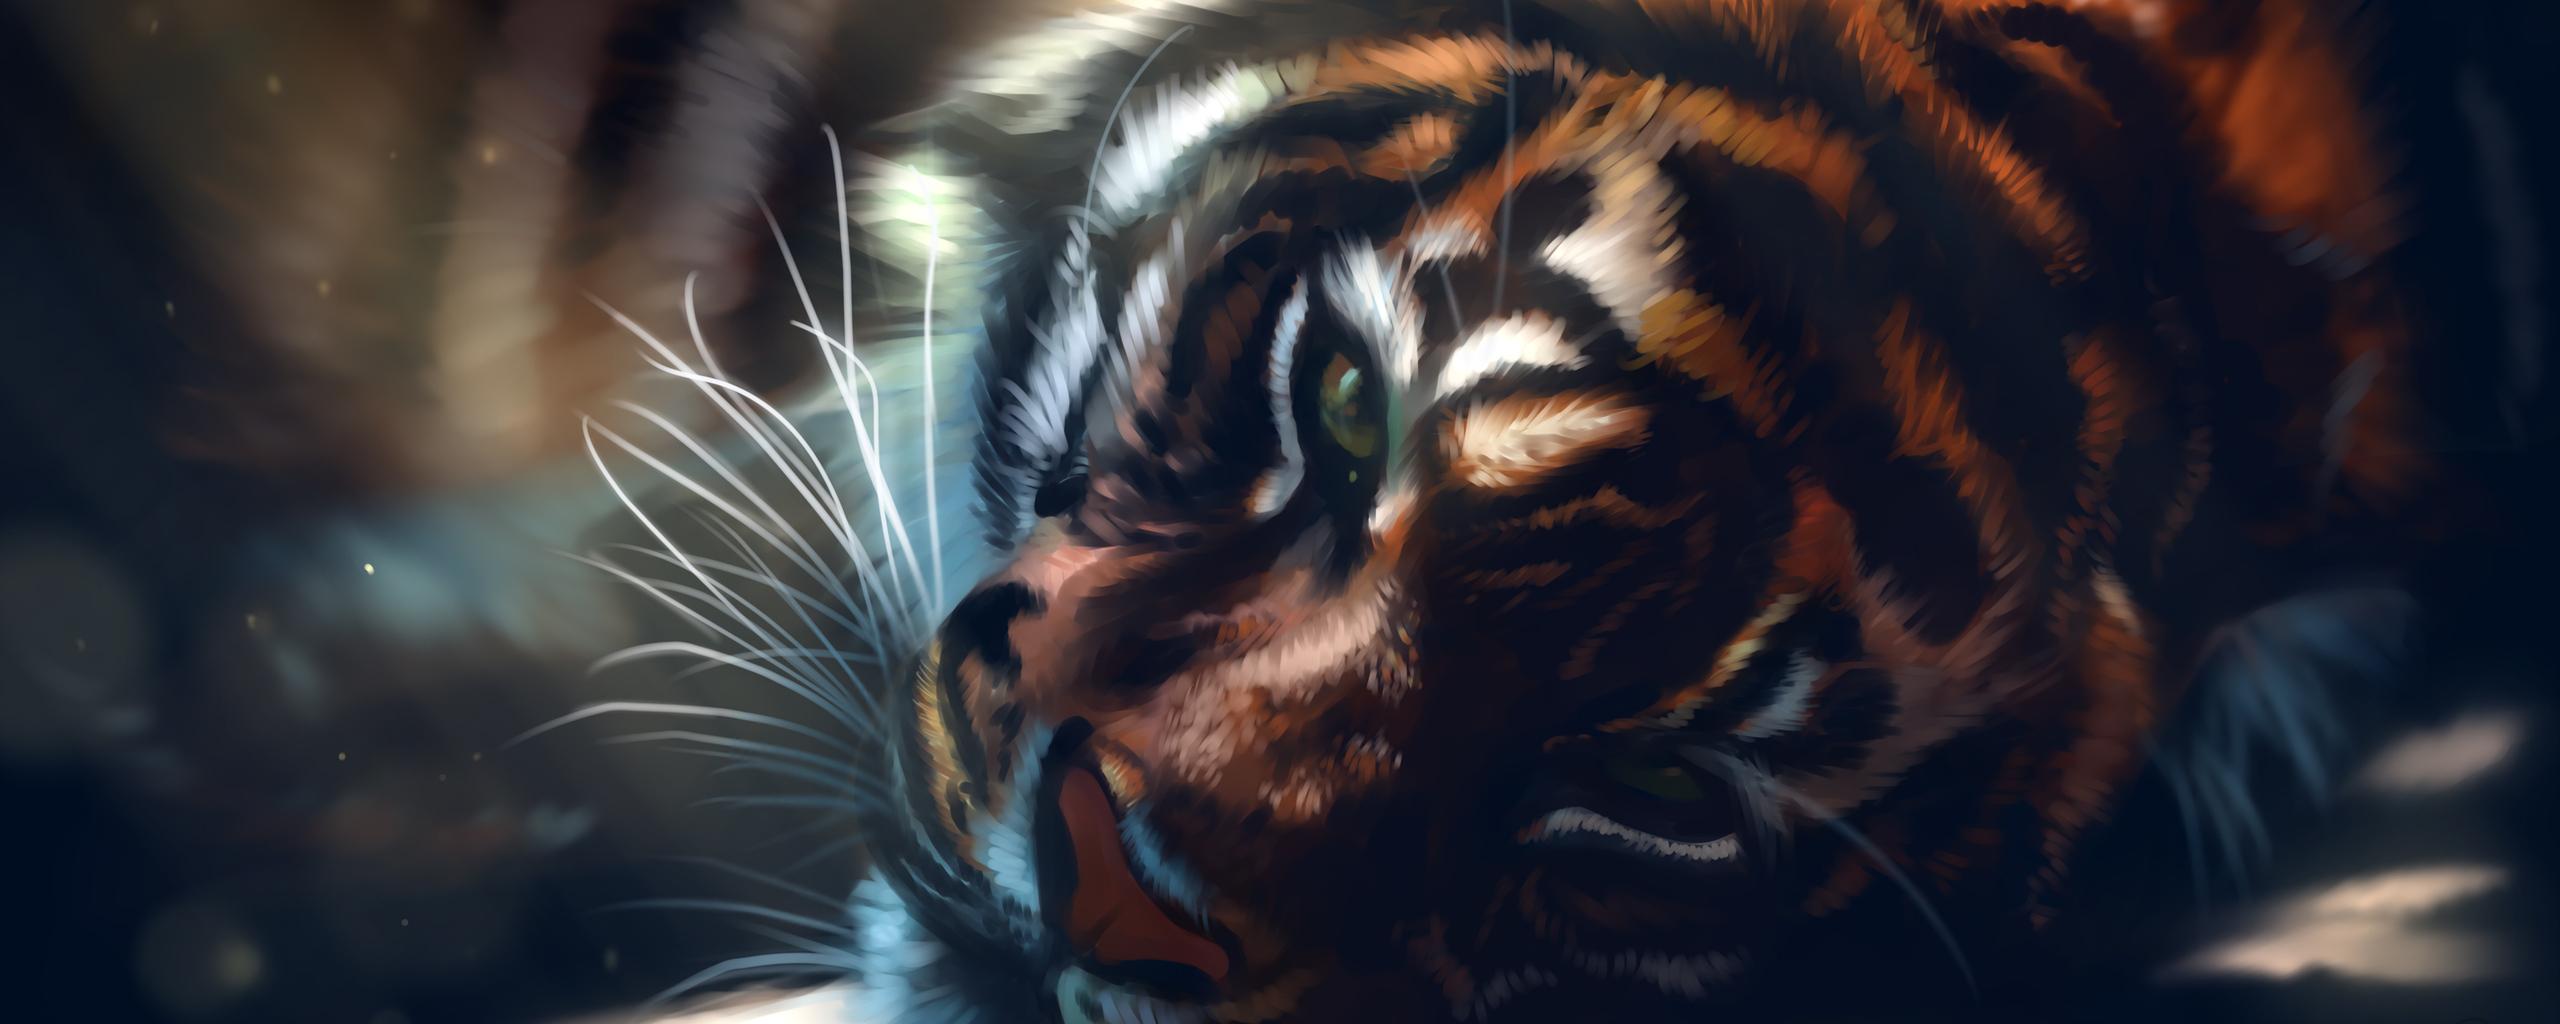 tiger-lying-down-art-bj.jpg